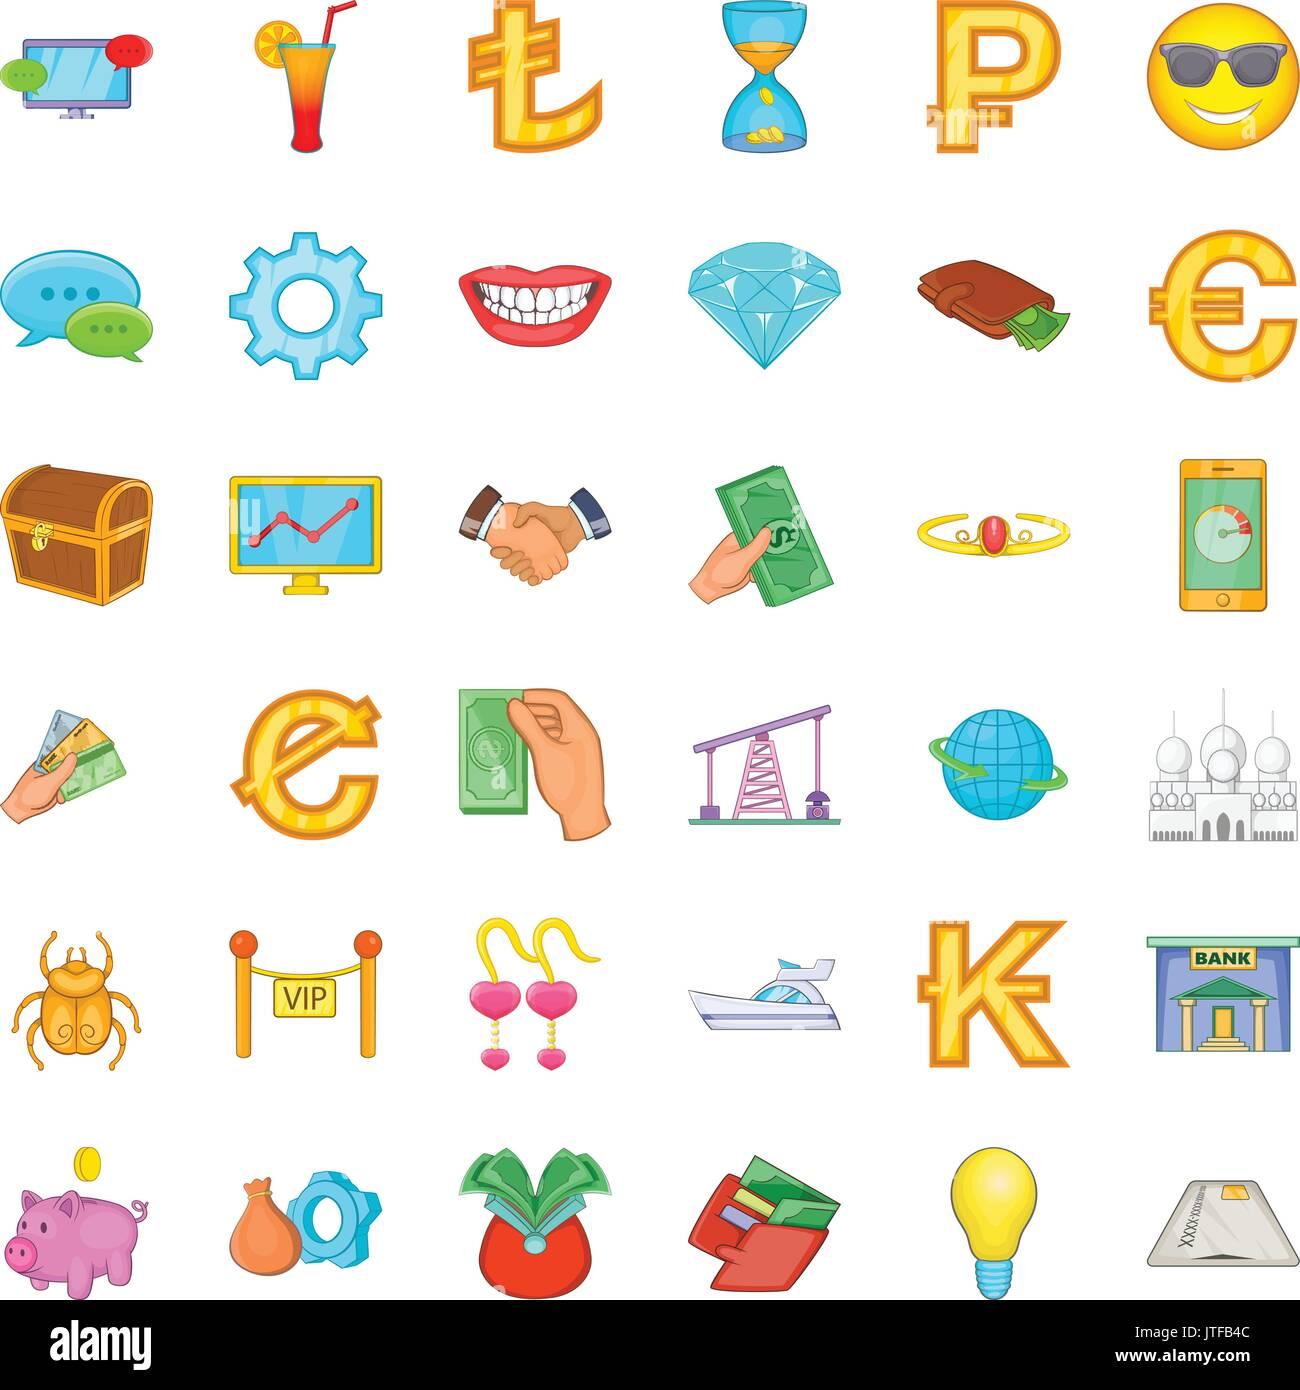 Riches icons set, cartoon style - Stock Image